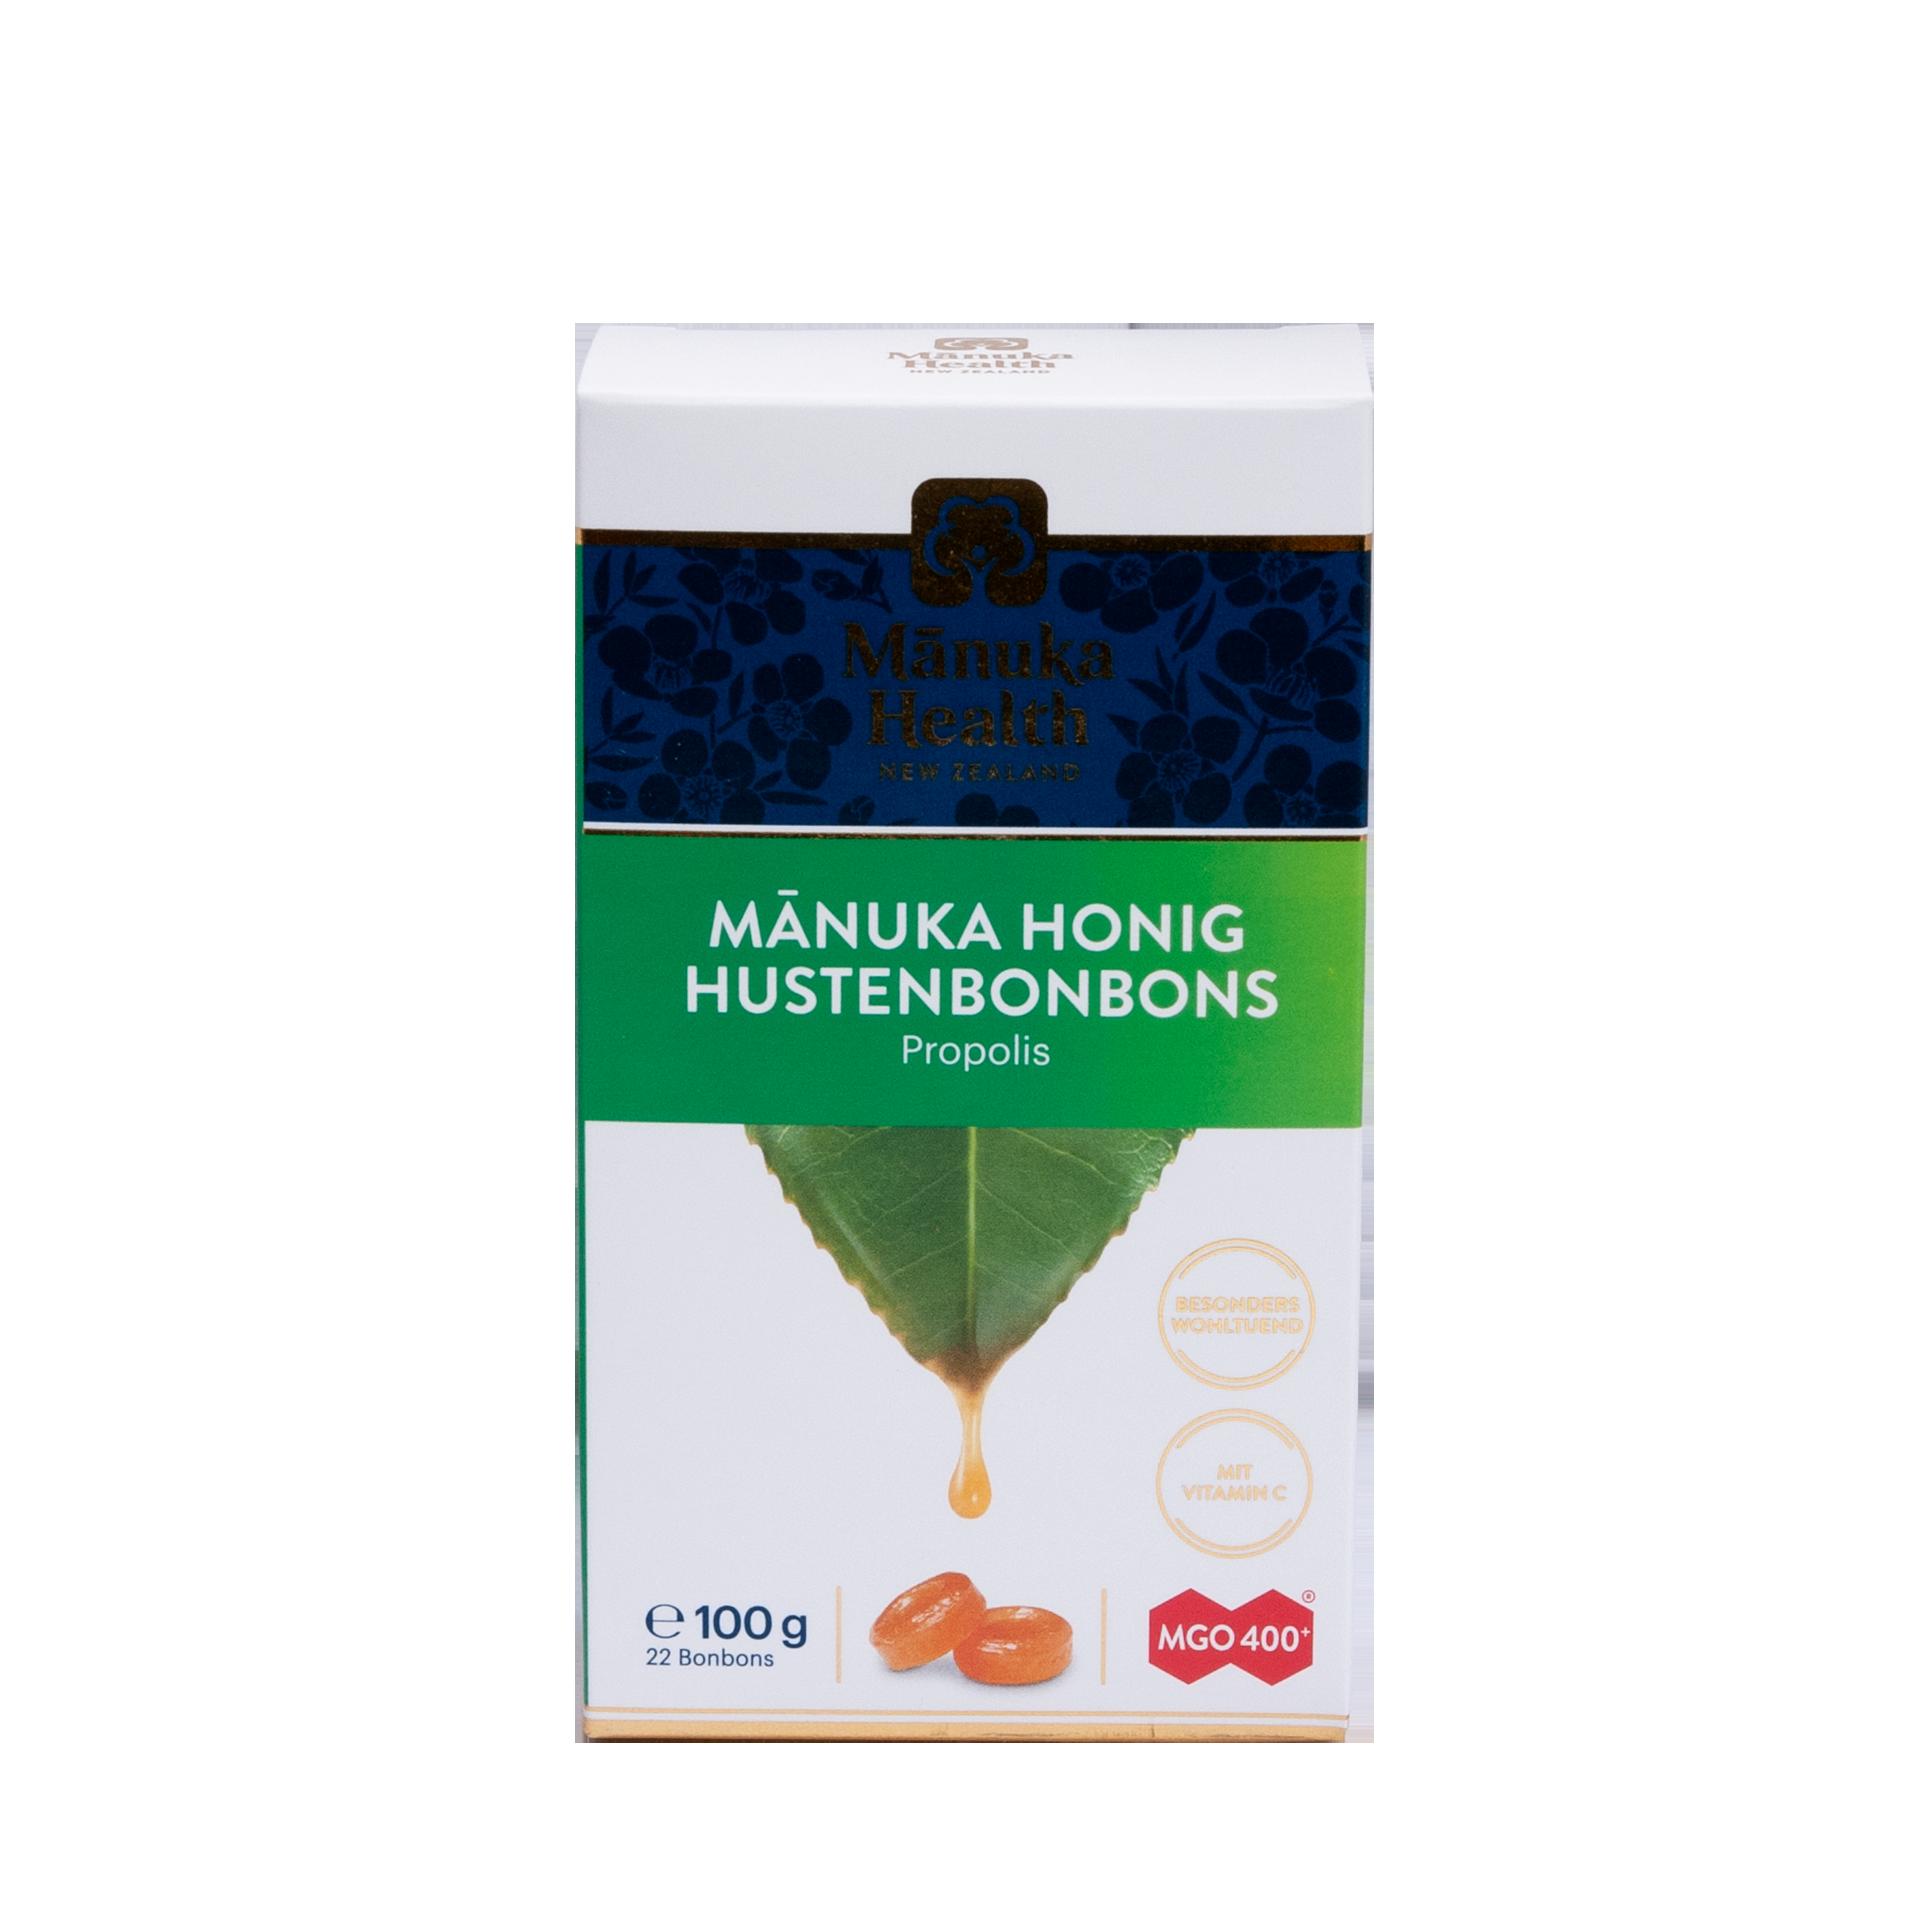 Manuka Honig Lutschbonbons, Propolis, 100 g